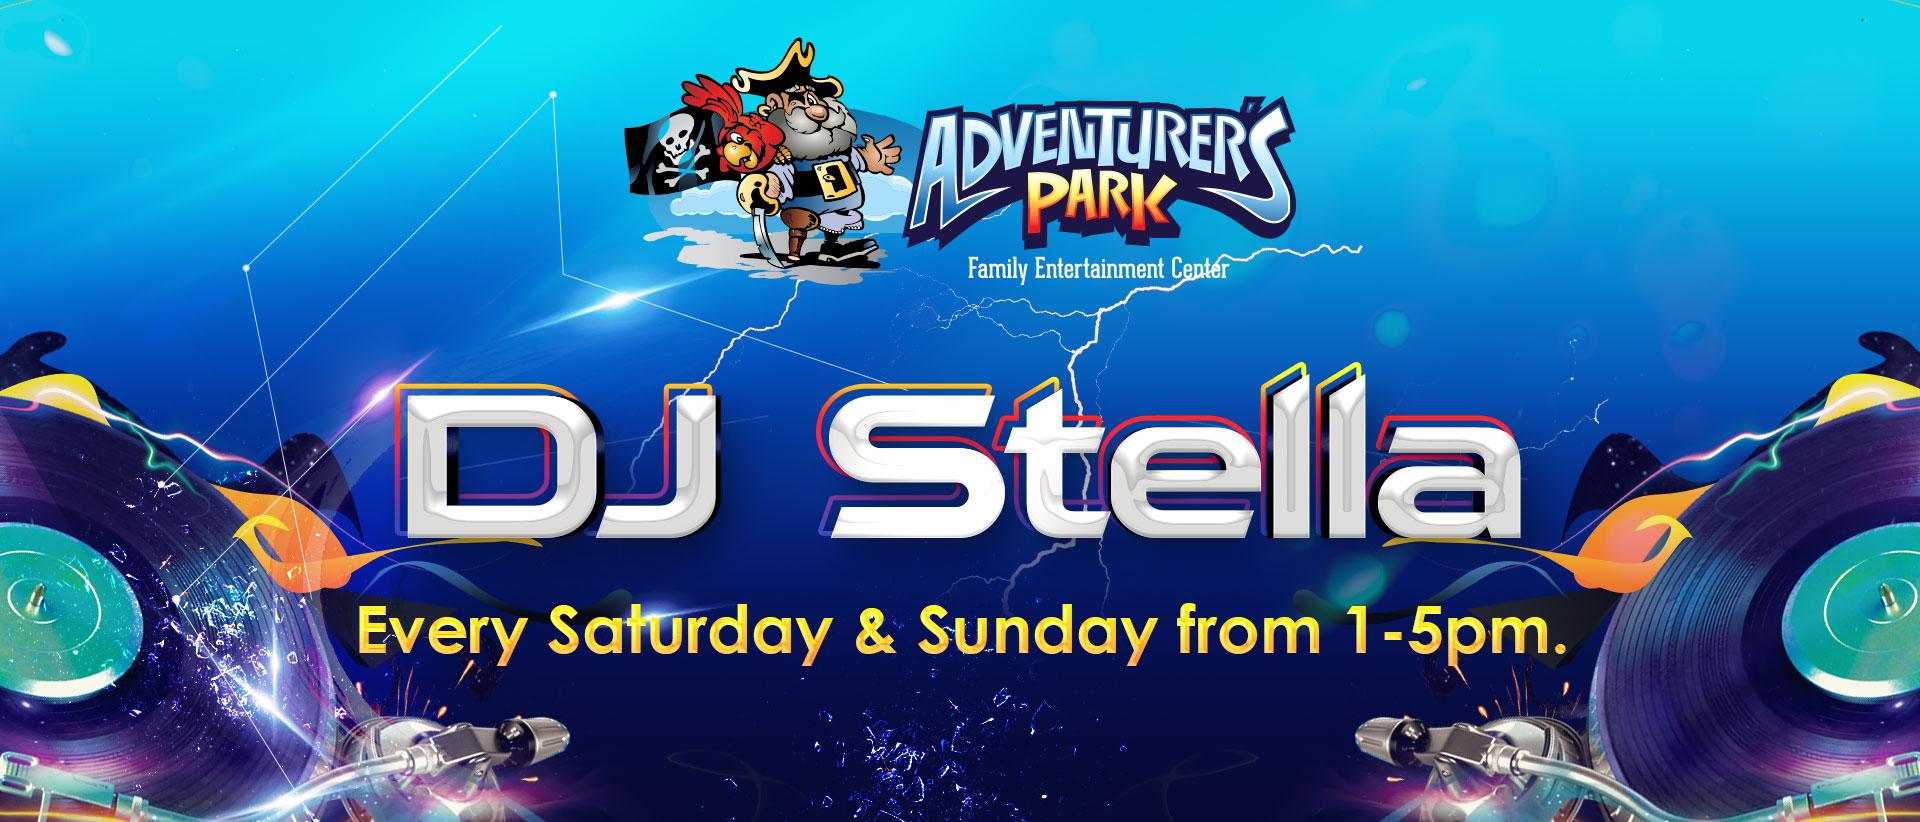 DJ Stella at Adventurer's Park